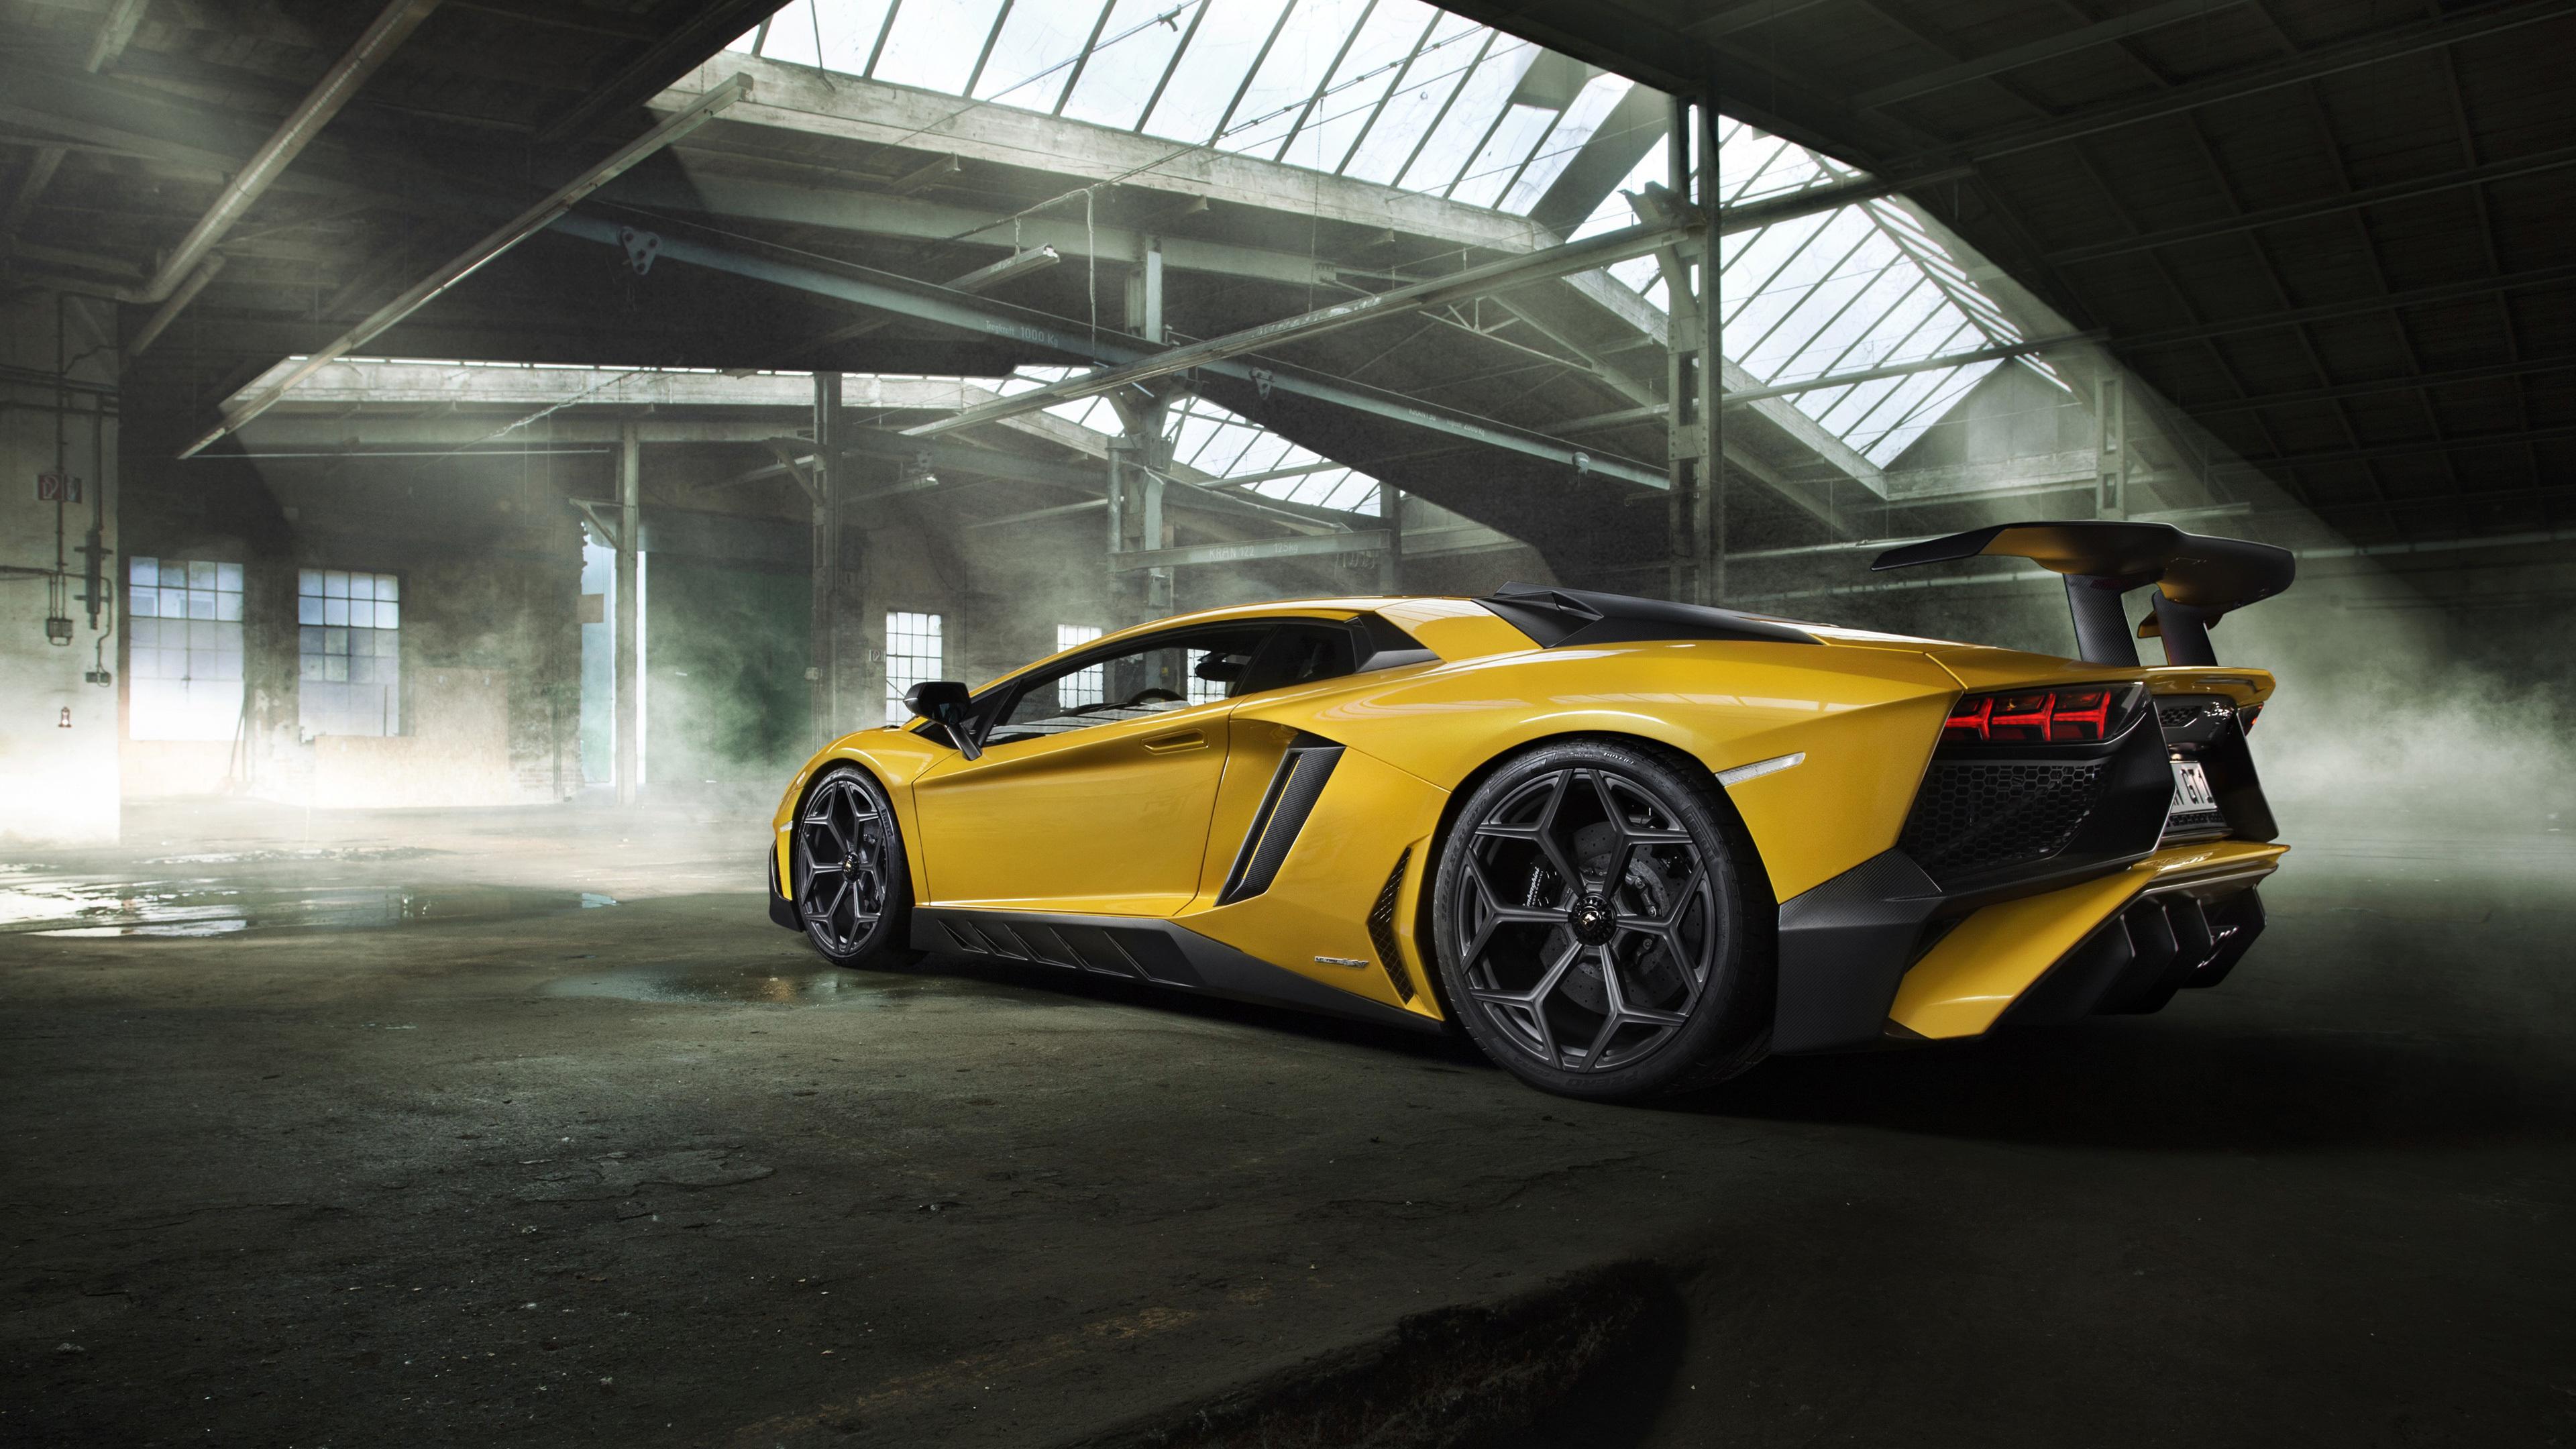 Lamborghini Aventador Wallpapers Images Photos Pictures ...